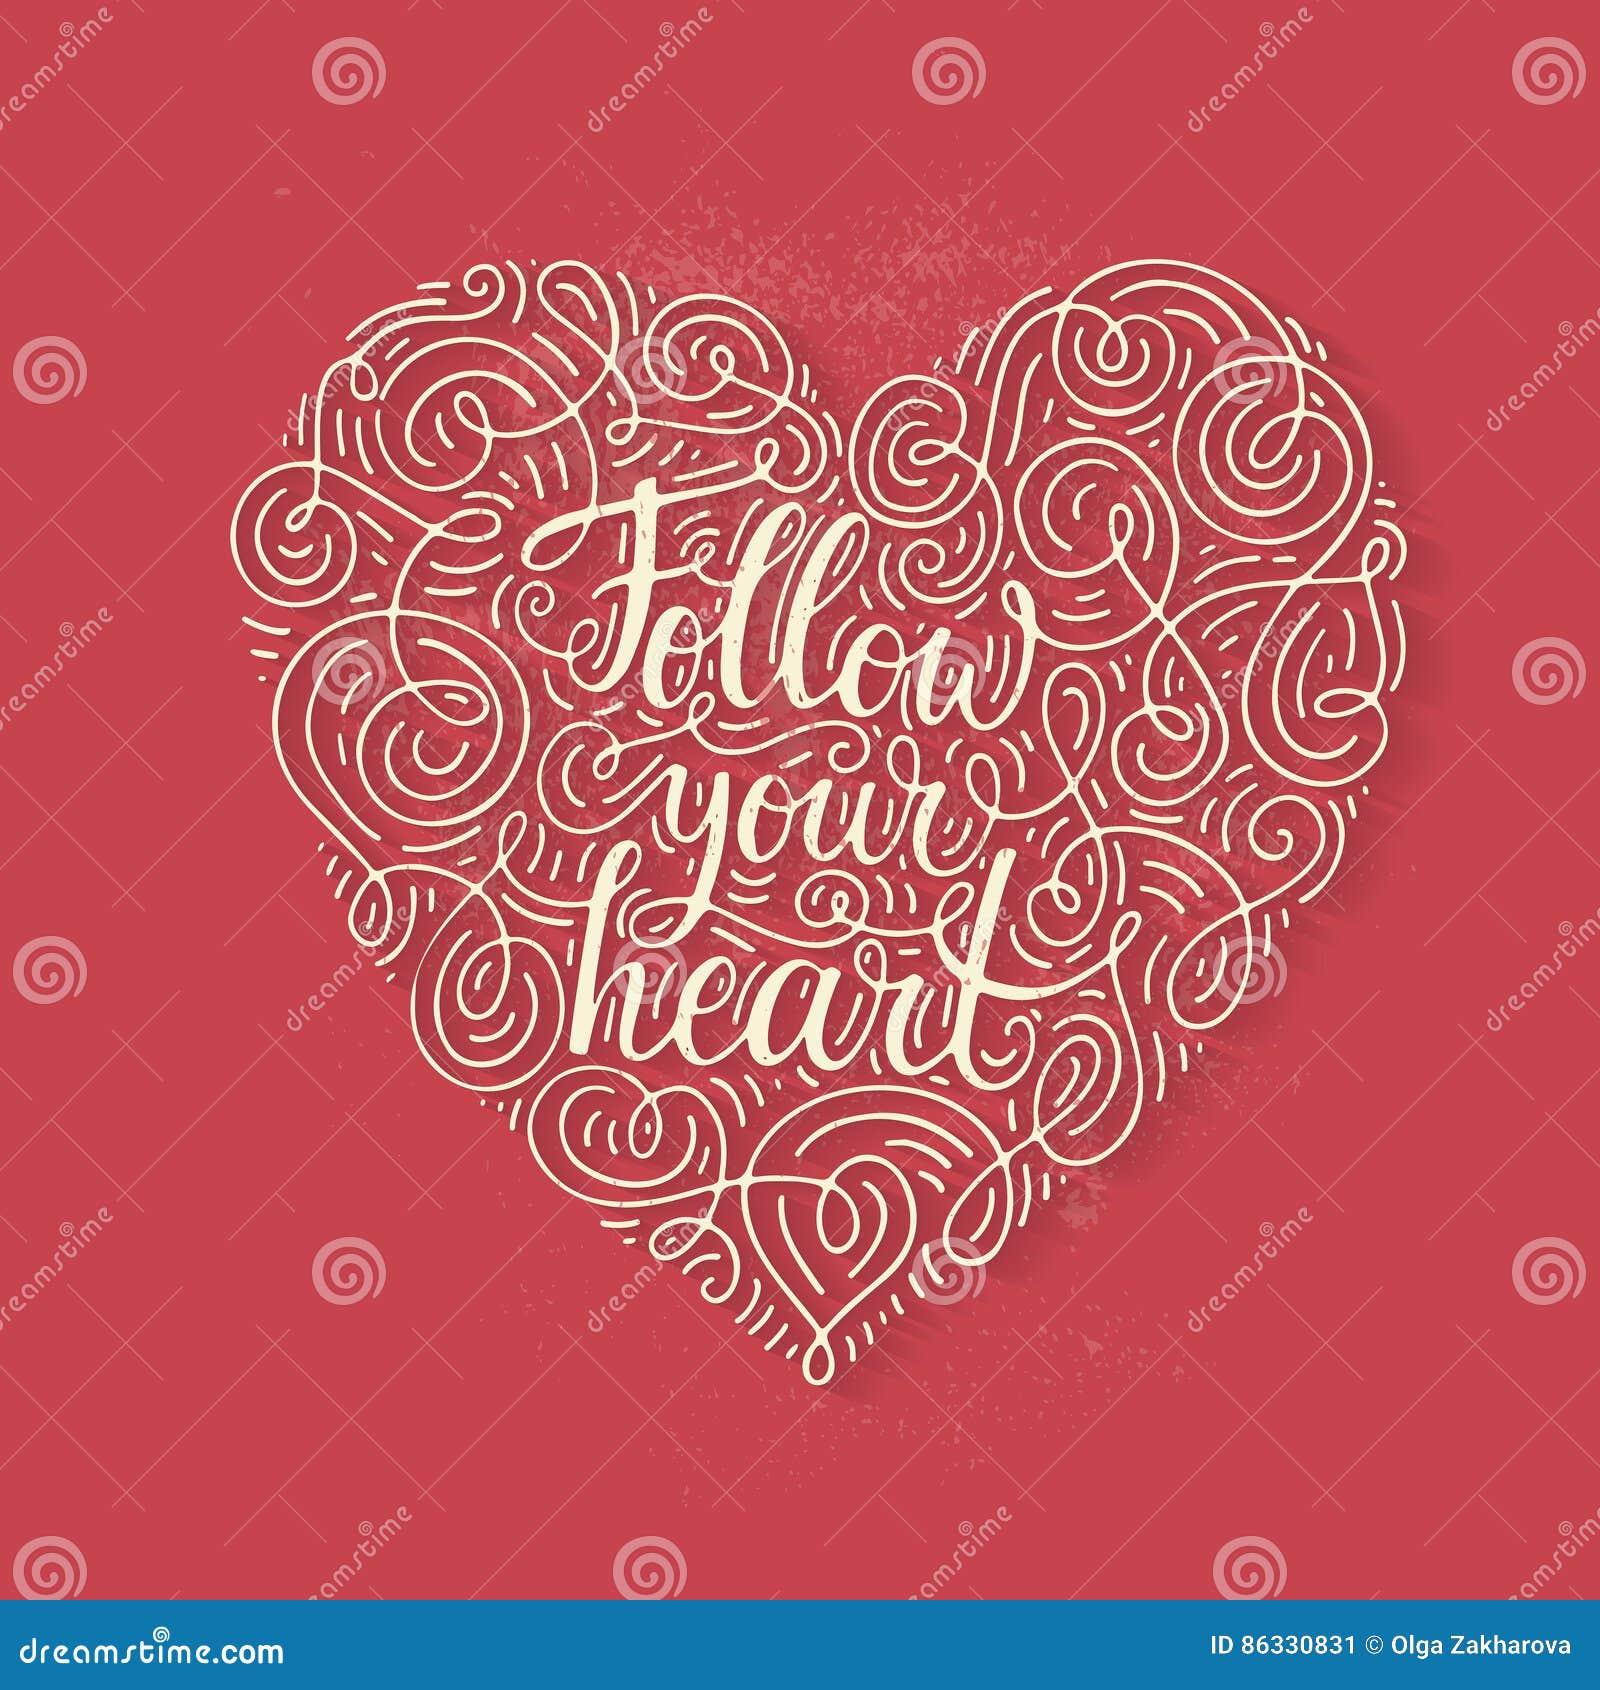 Follow Your Heart Stock Vector Illustration Of Phrase 86330831